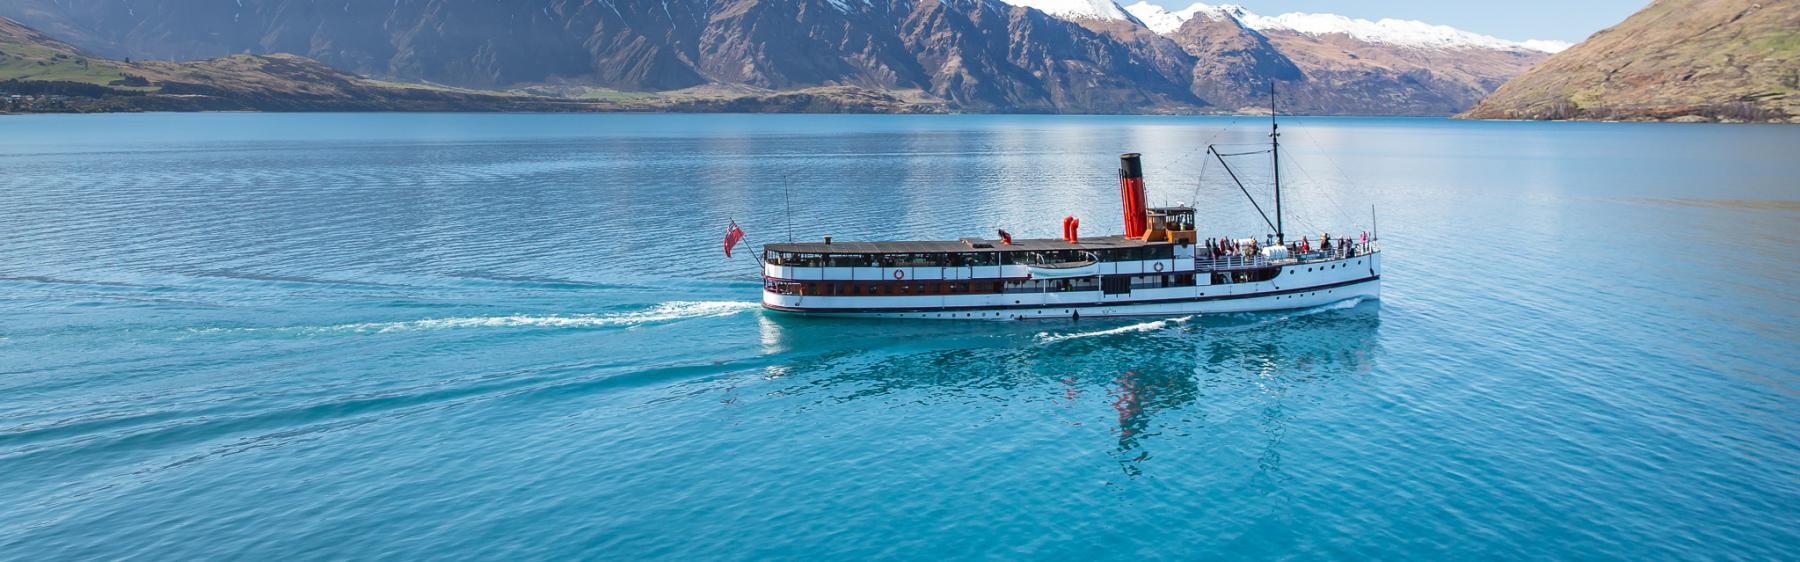 TSS Earnslaw Vintage Steamship Lake Cruises - Real Journeys